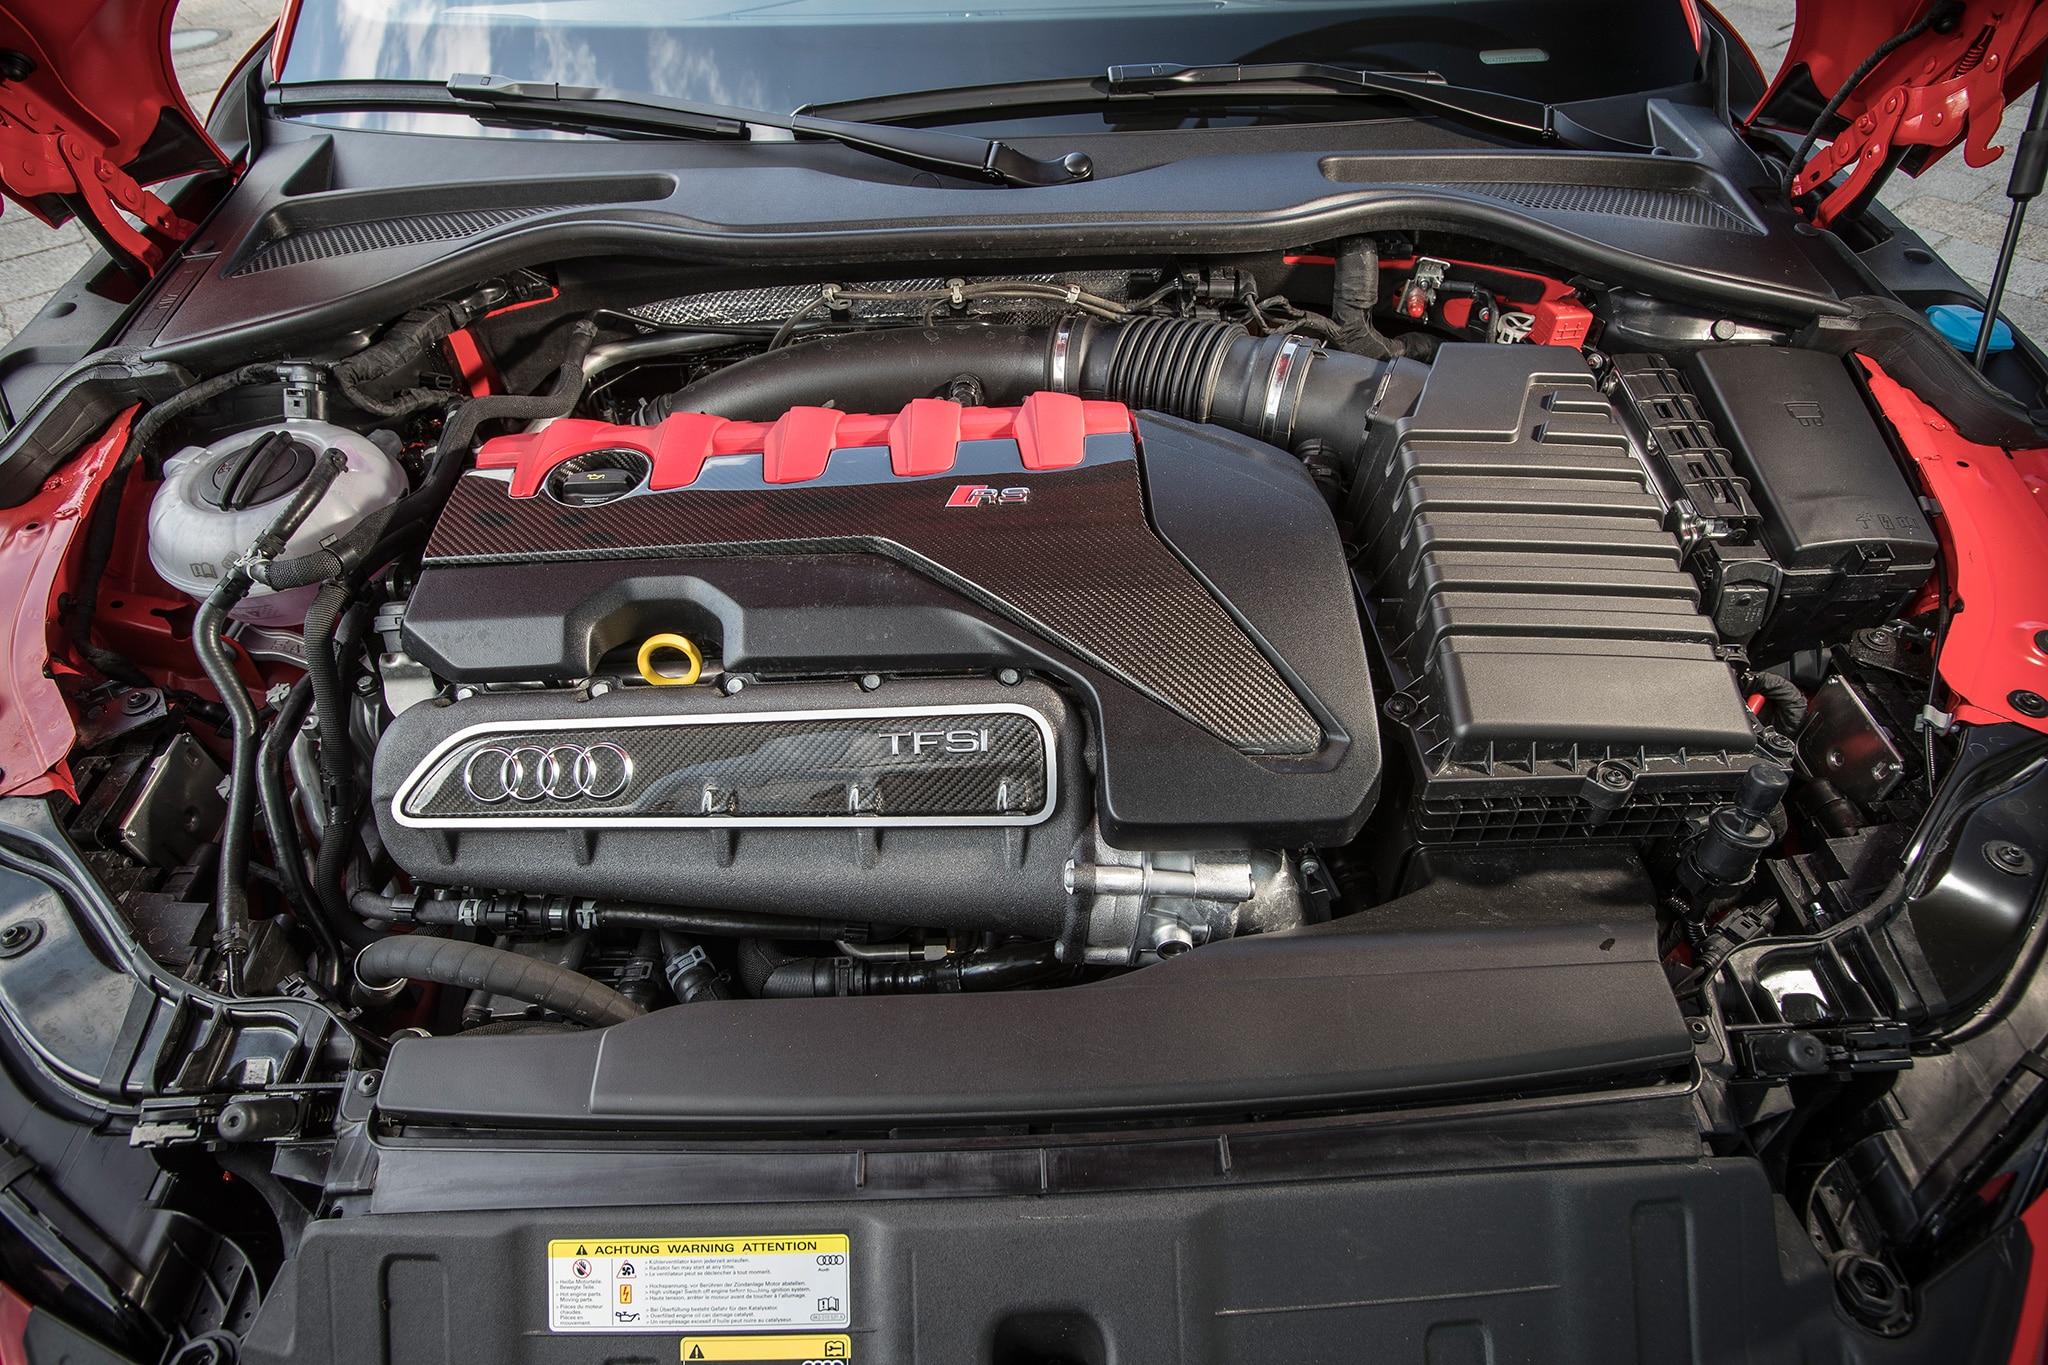 2018 Audi TT RS Engine